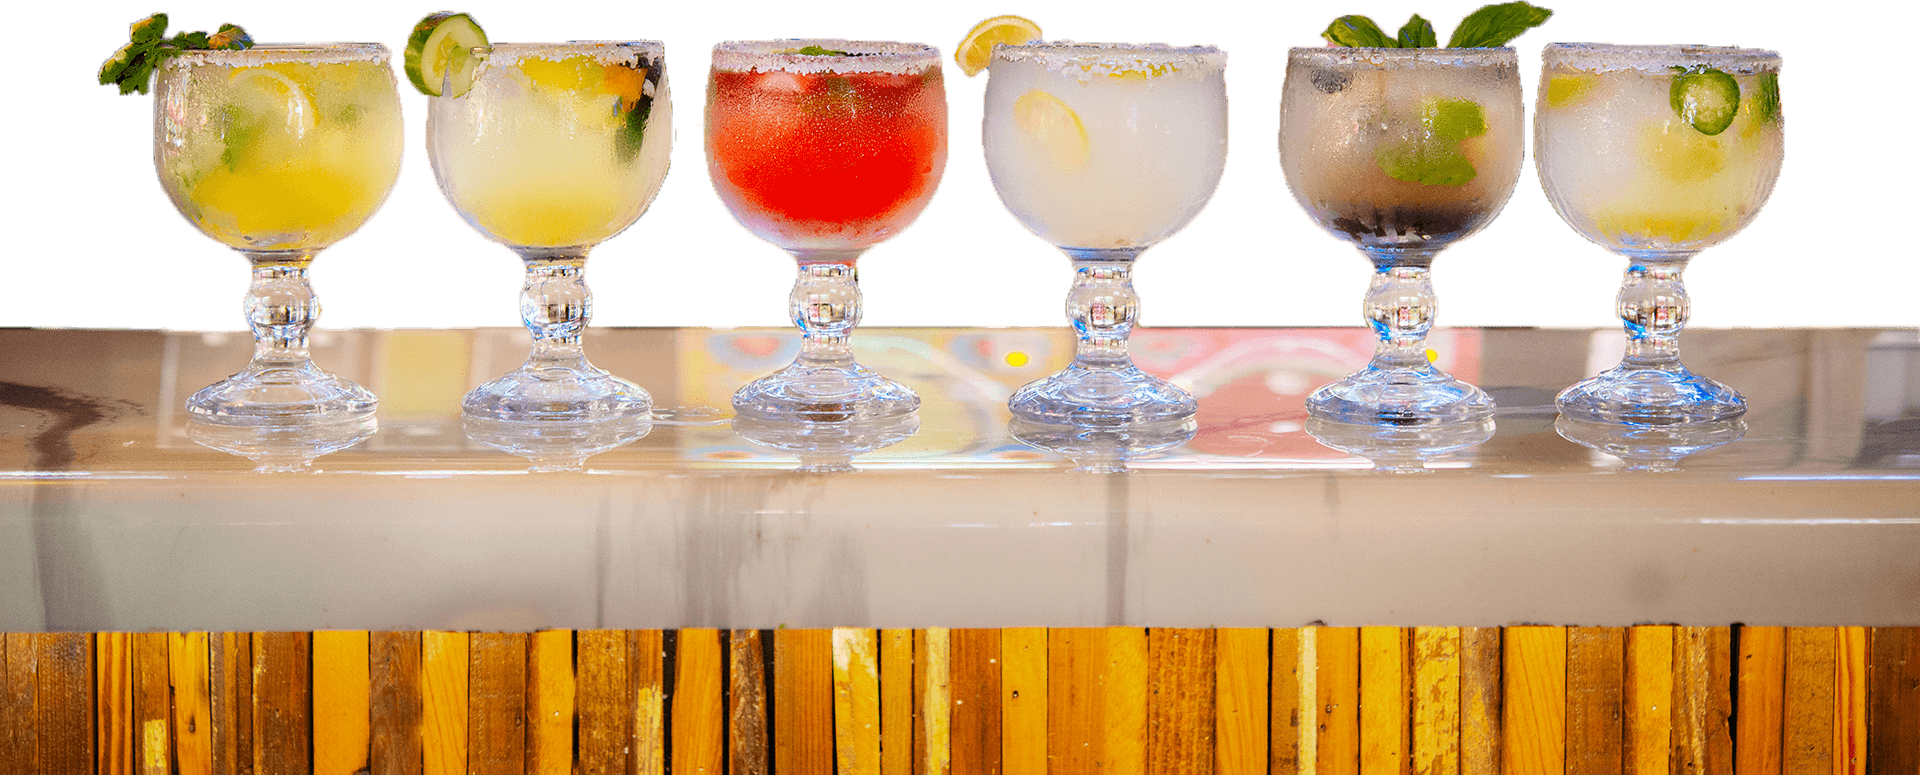 Row of colorful La Carreta margaritas on the bar.